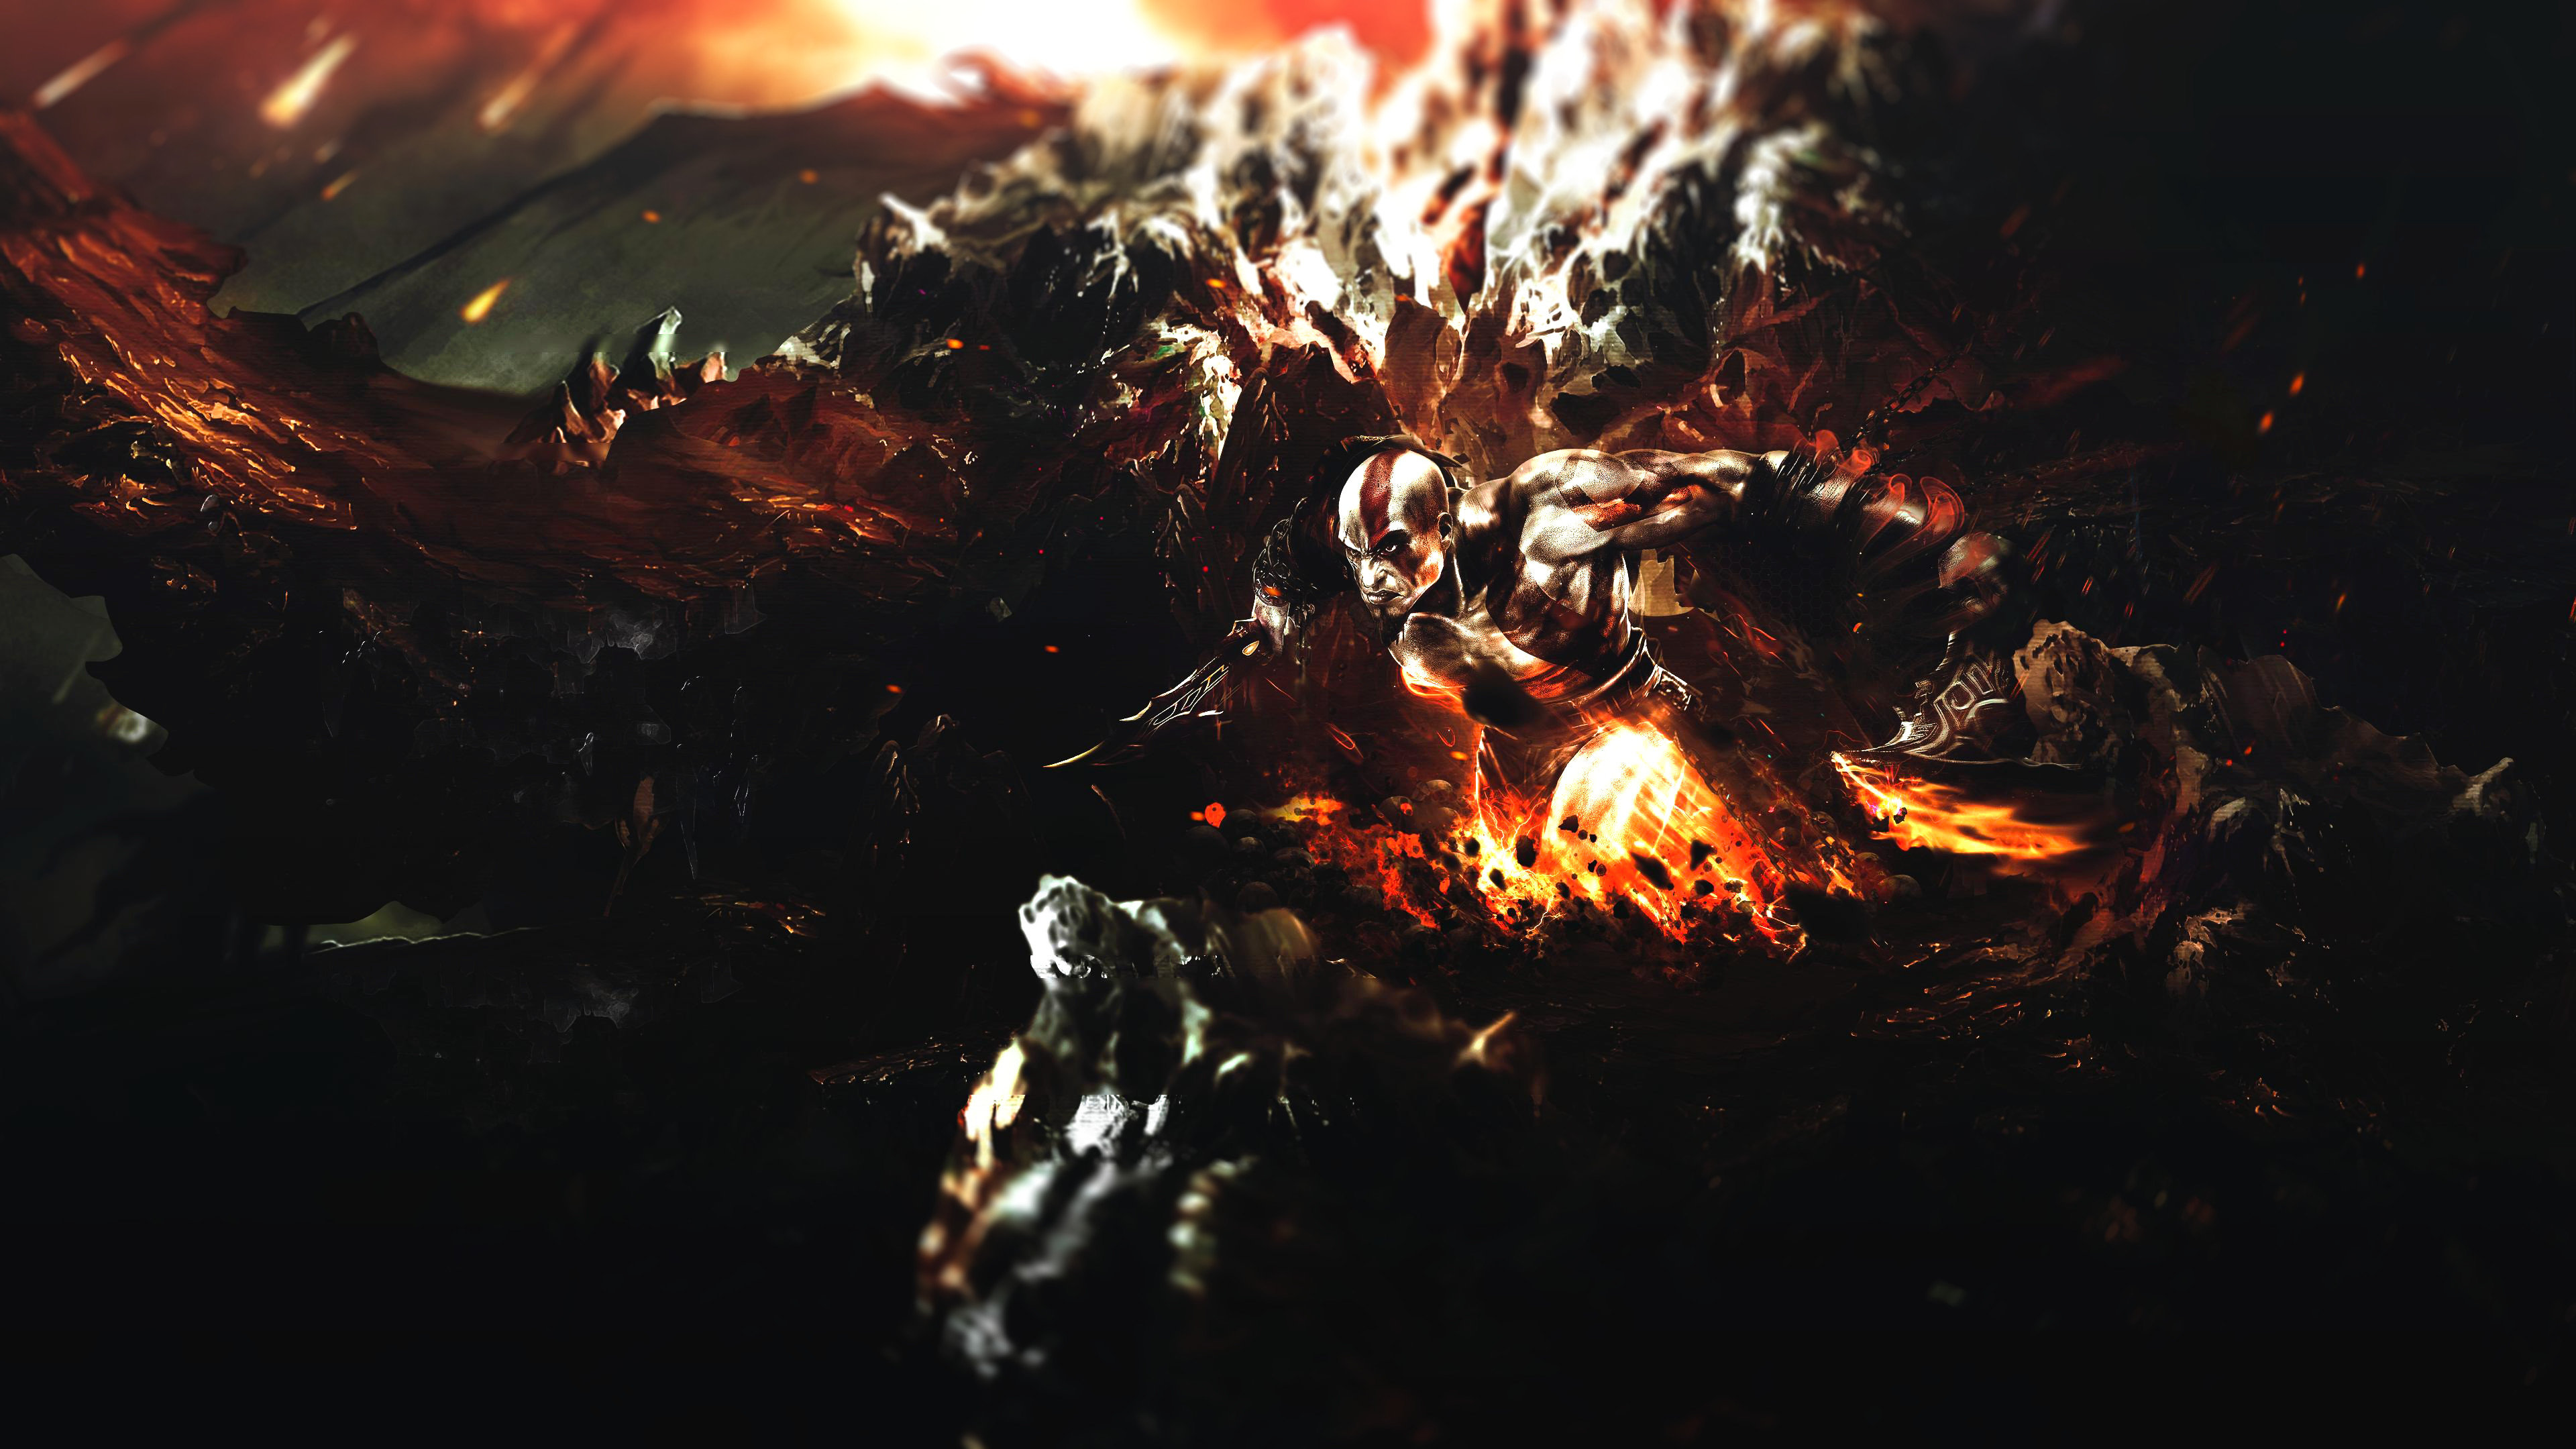 God Of War Wallpapers 3840x2160 Ultra Hd 4k Desktop Backgrounds